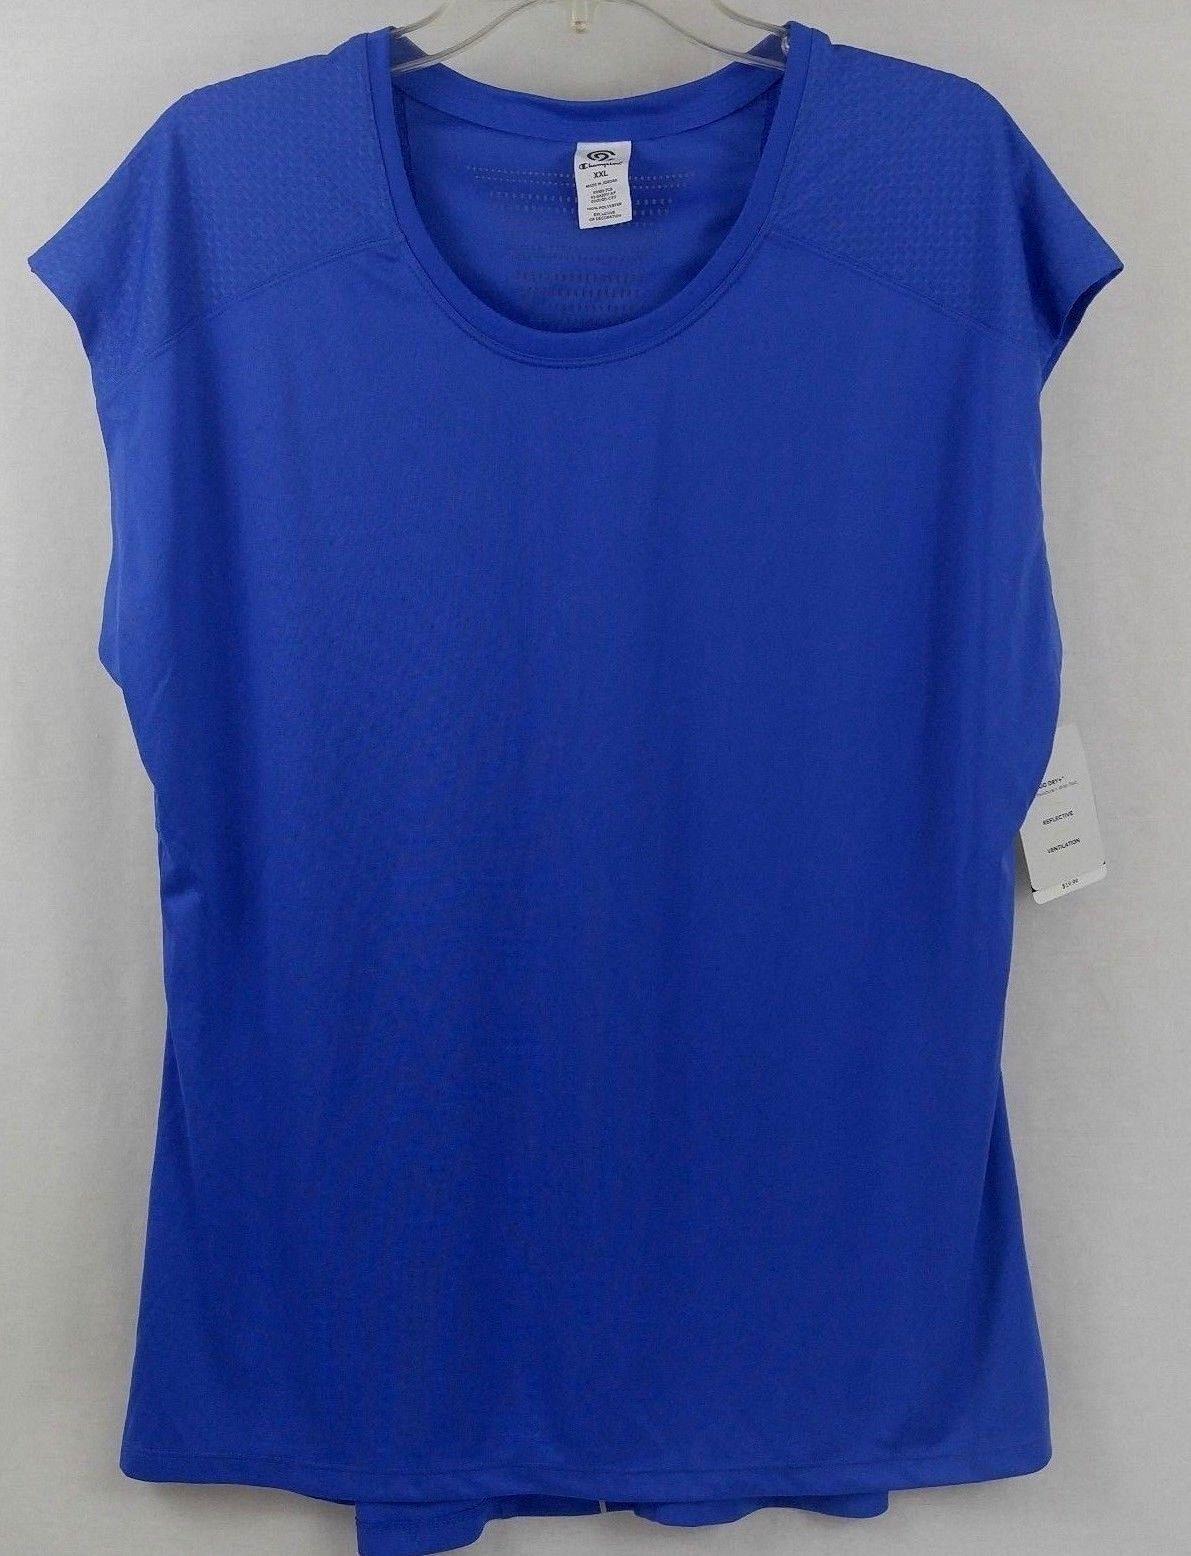 5be9bfc28 C9 Champion Women s Mesh Run T-shirt Steel and 50 similar items. 57